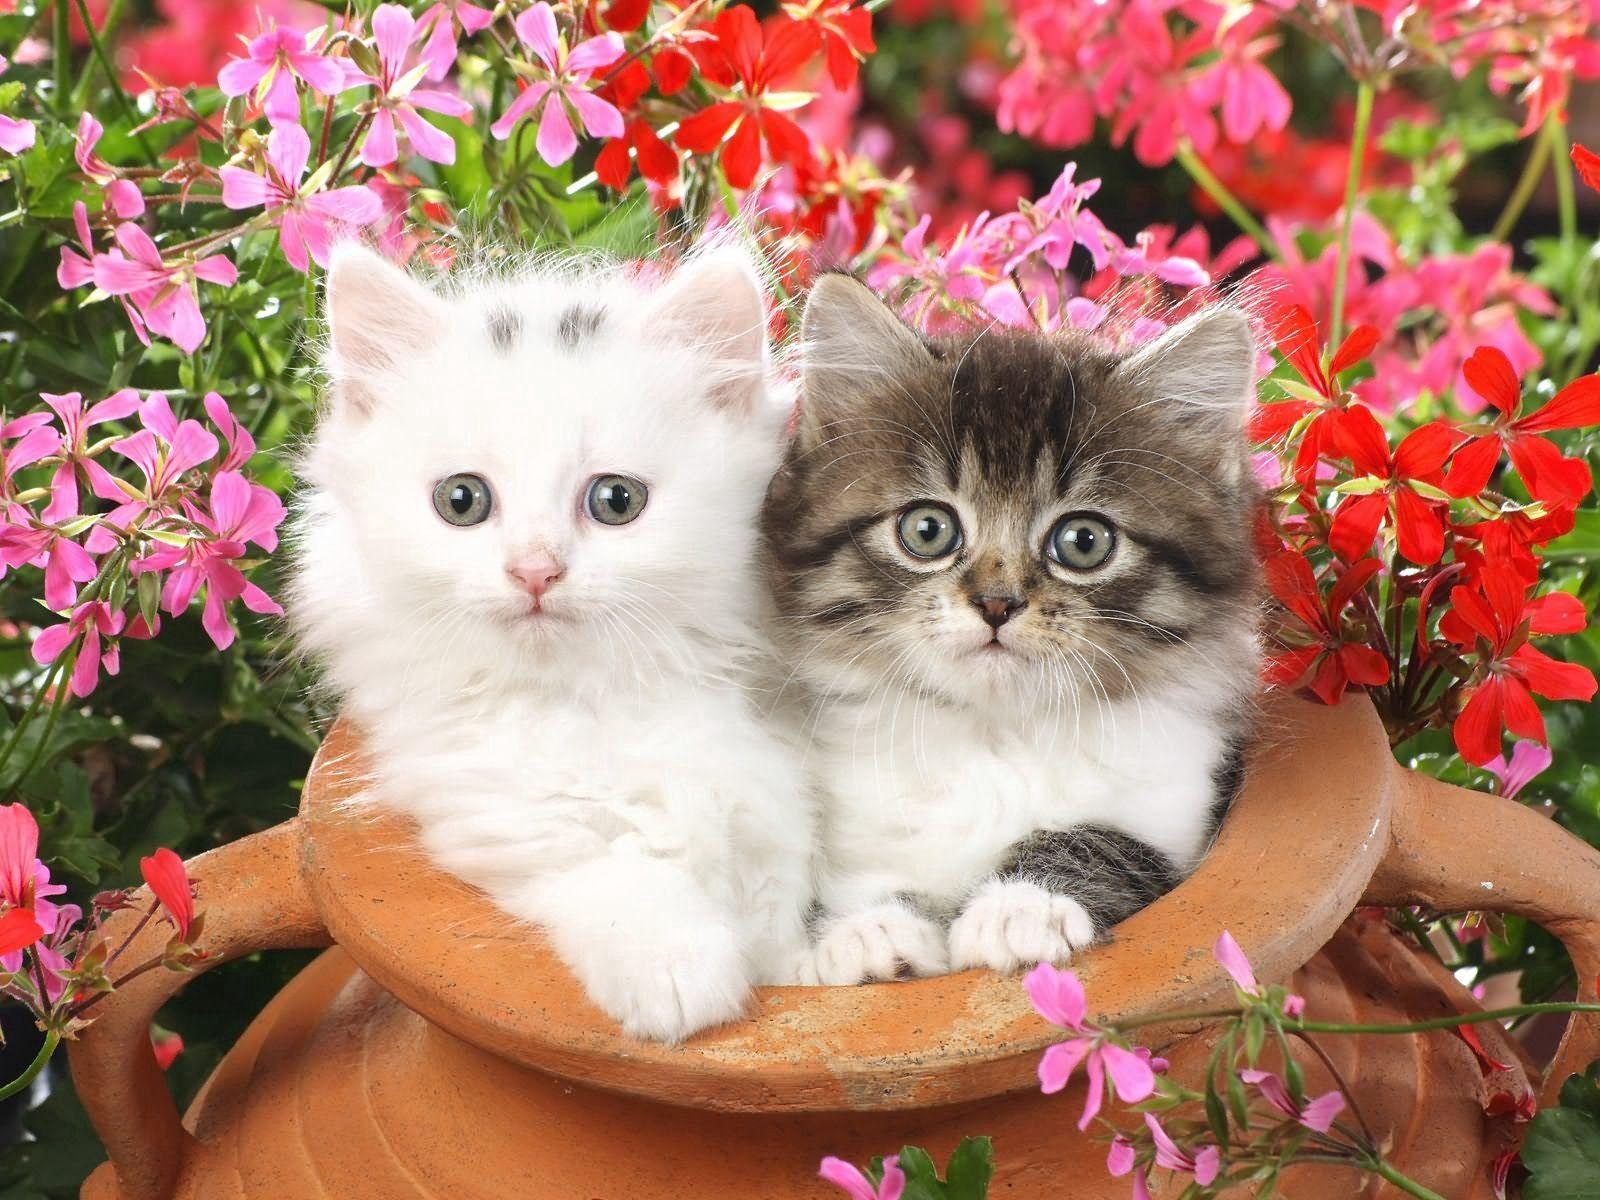 86238 завантажити шпалери Квіти, Тварини, Пара, Горщик, Кошенята, Кошенят - заставки і картинки безкоштовно